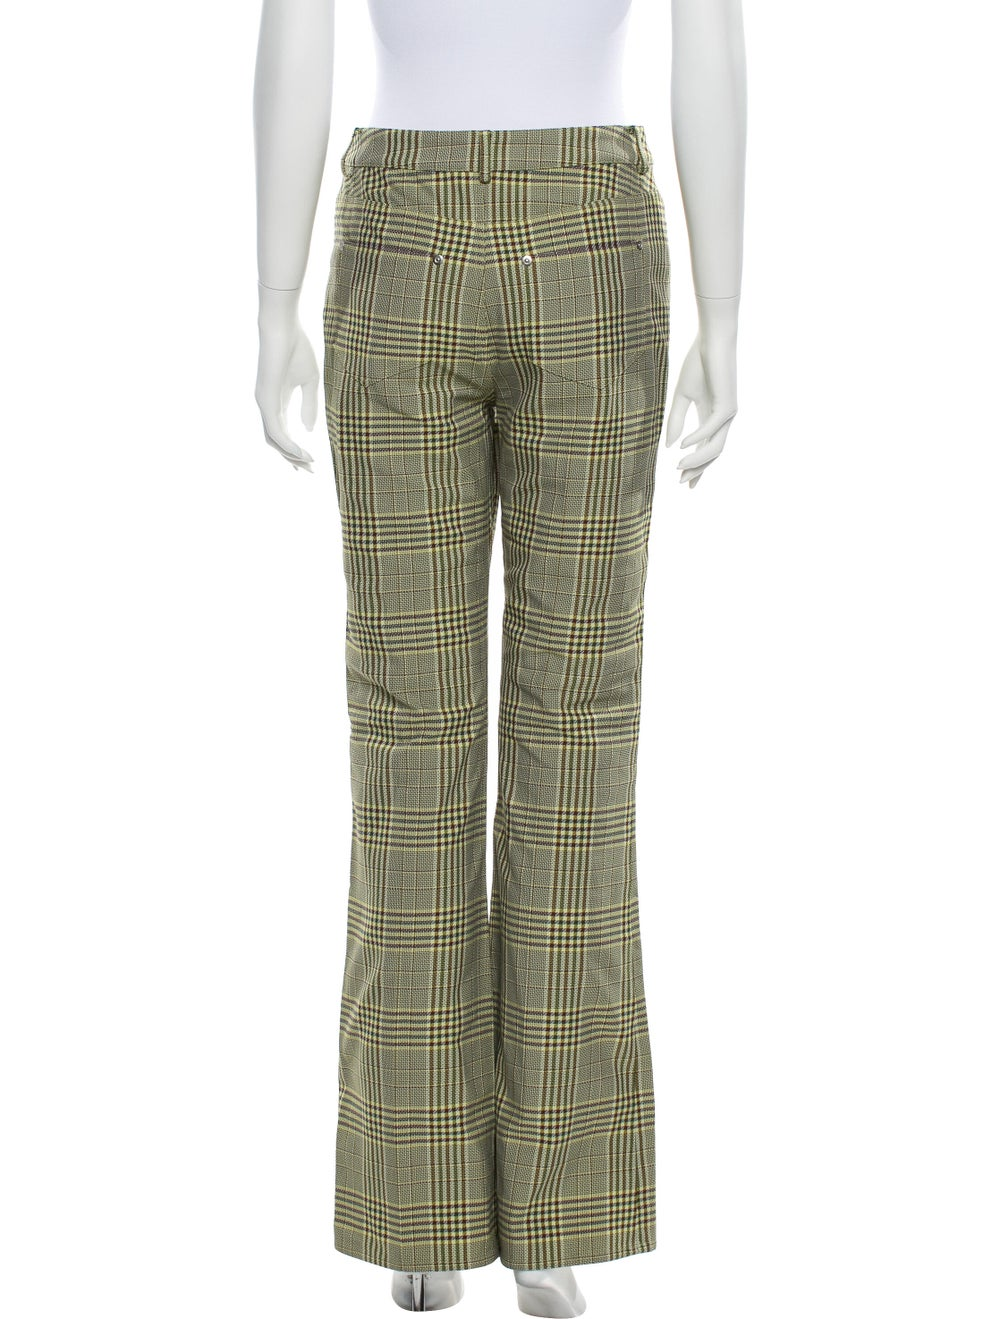 Adeam Plaid Print Flared Pants w/ Tags Yellow - image 3